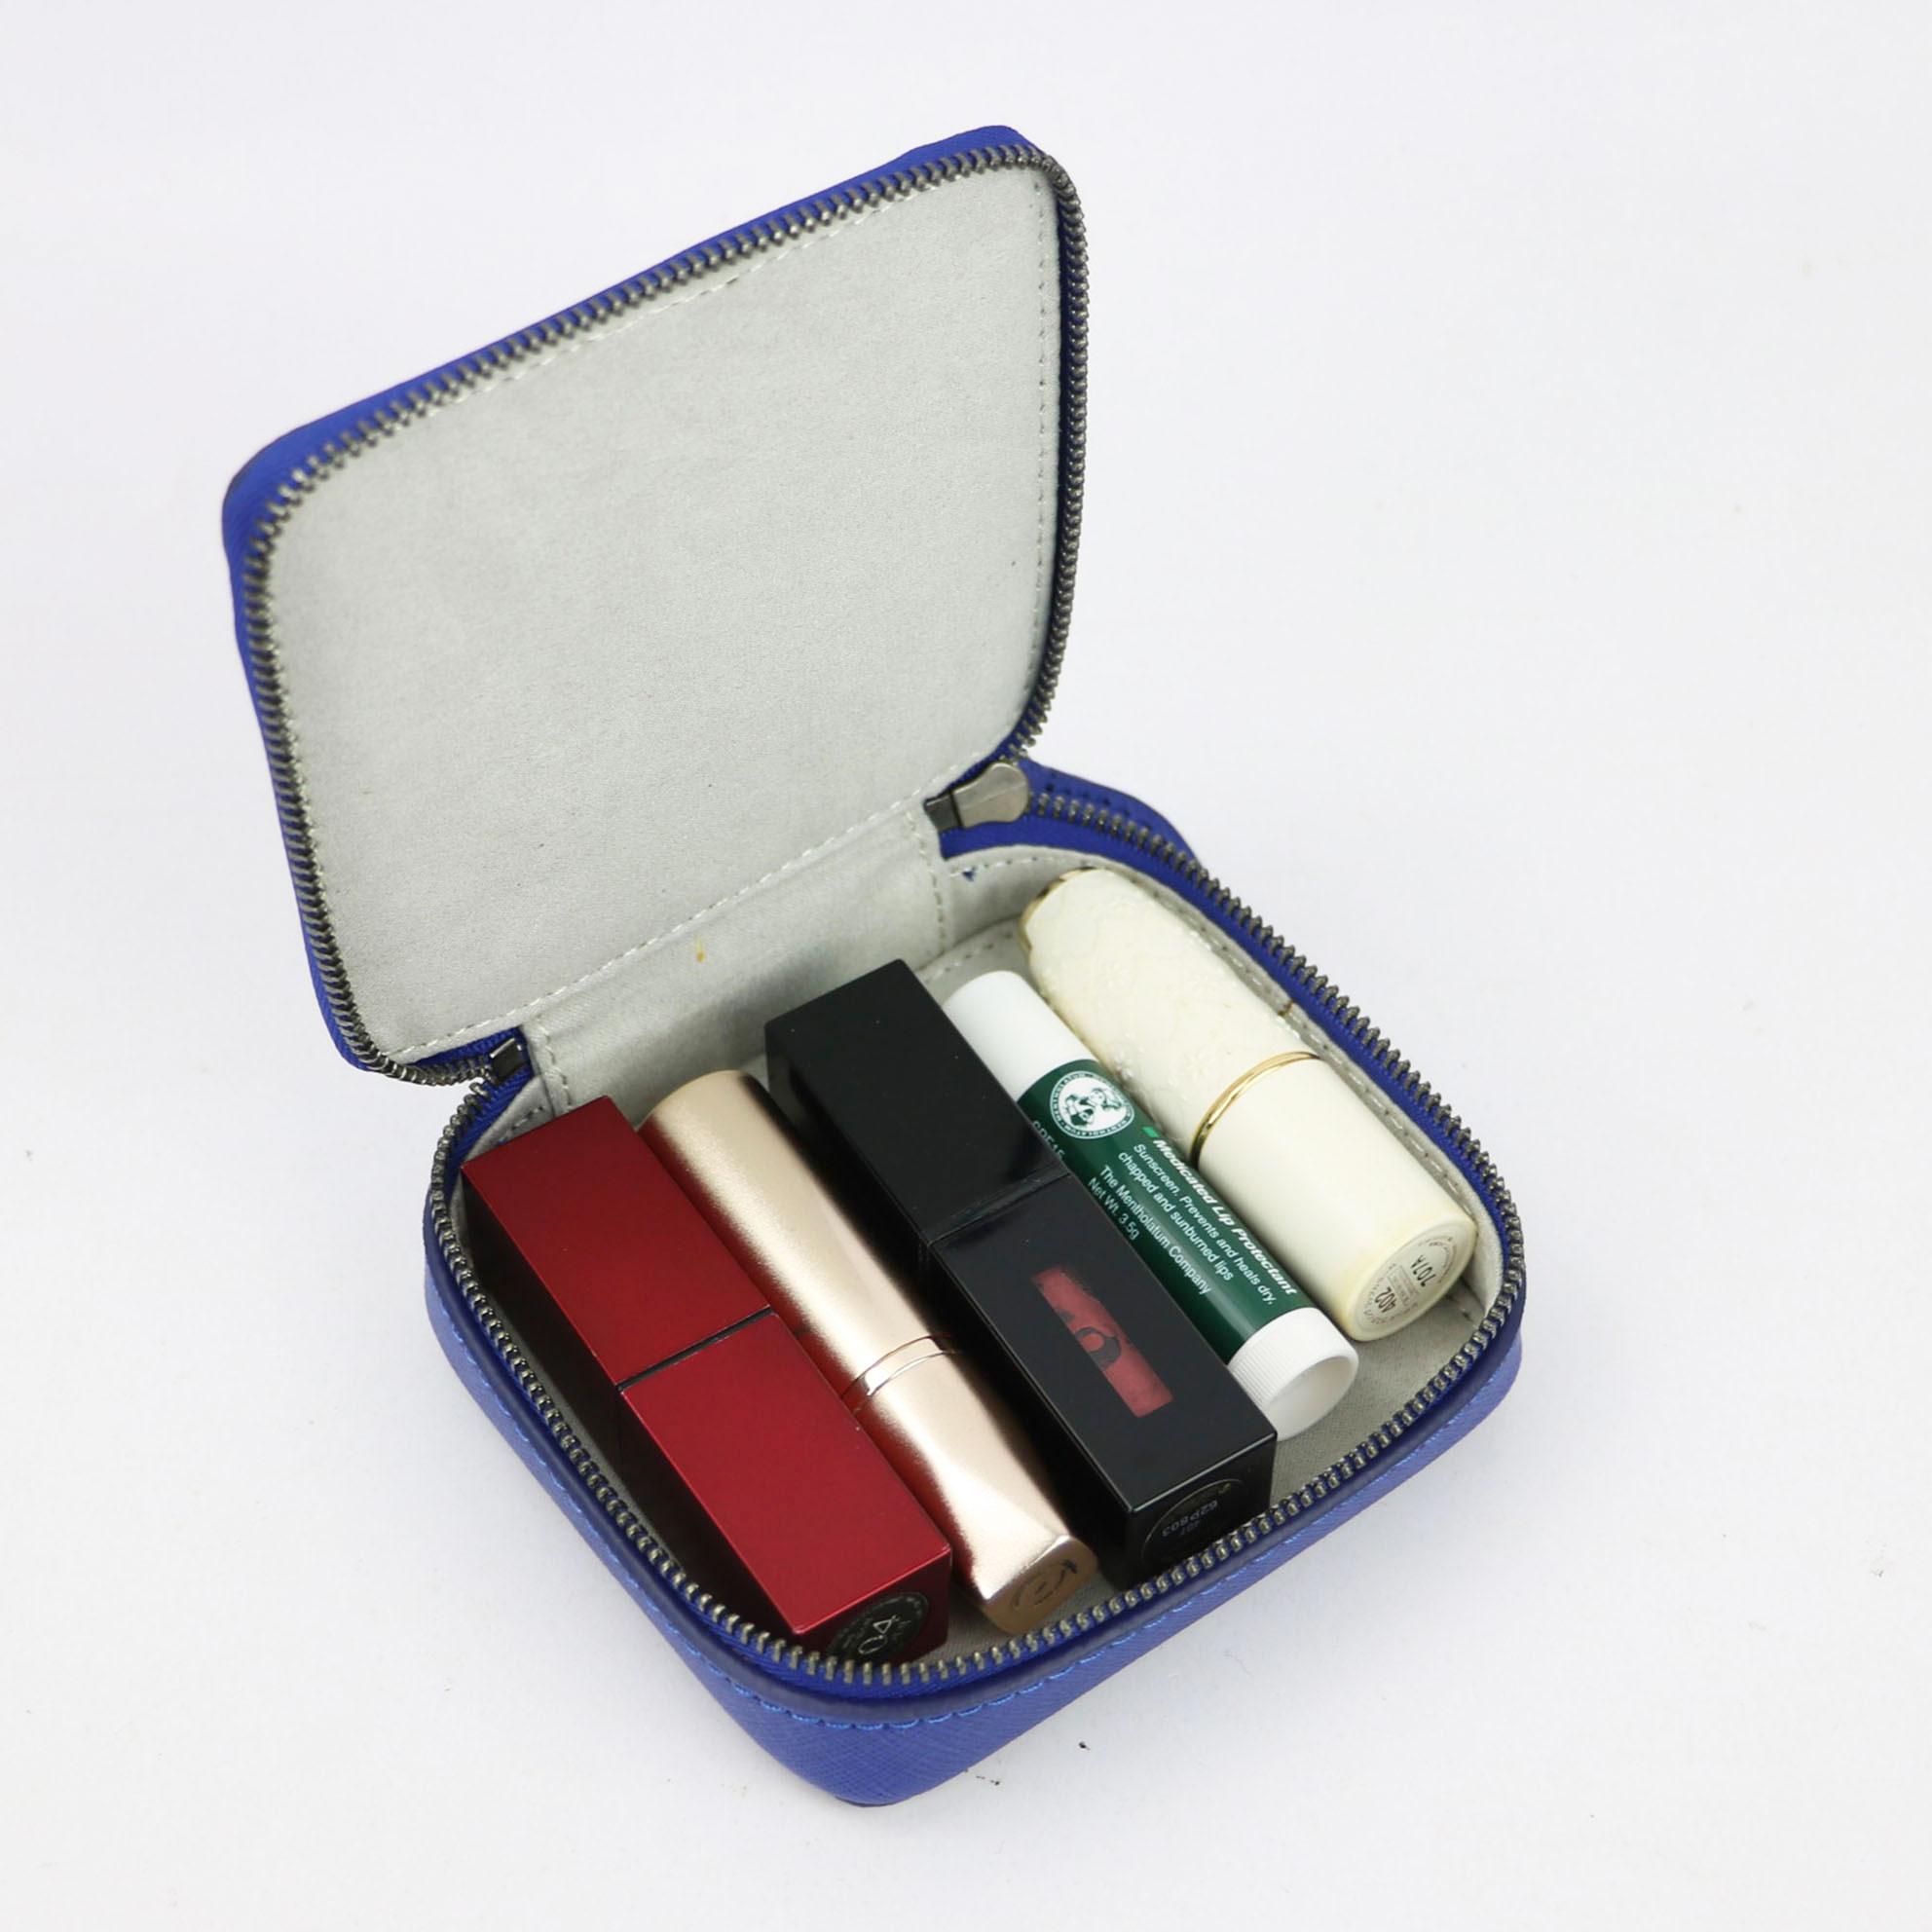 2020 Saffiano Genuine Leather Box For Jewelry New Style Portable Organizer Display Travel Jewelry Box Zipper Makeup Storage Box